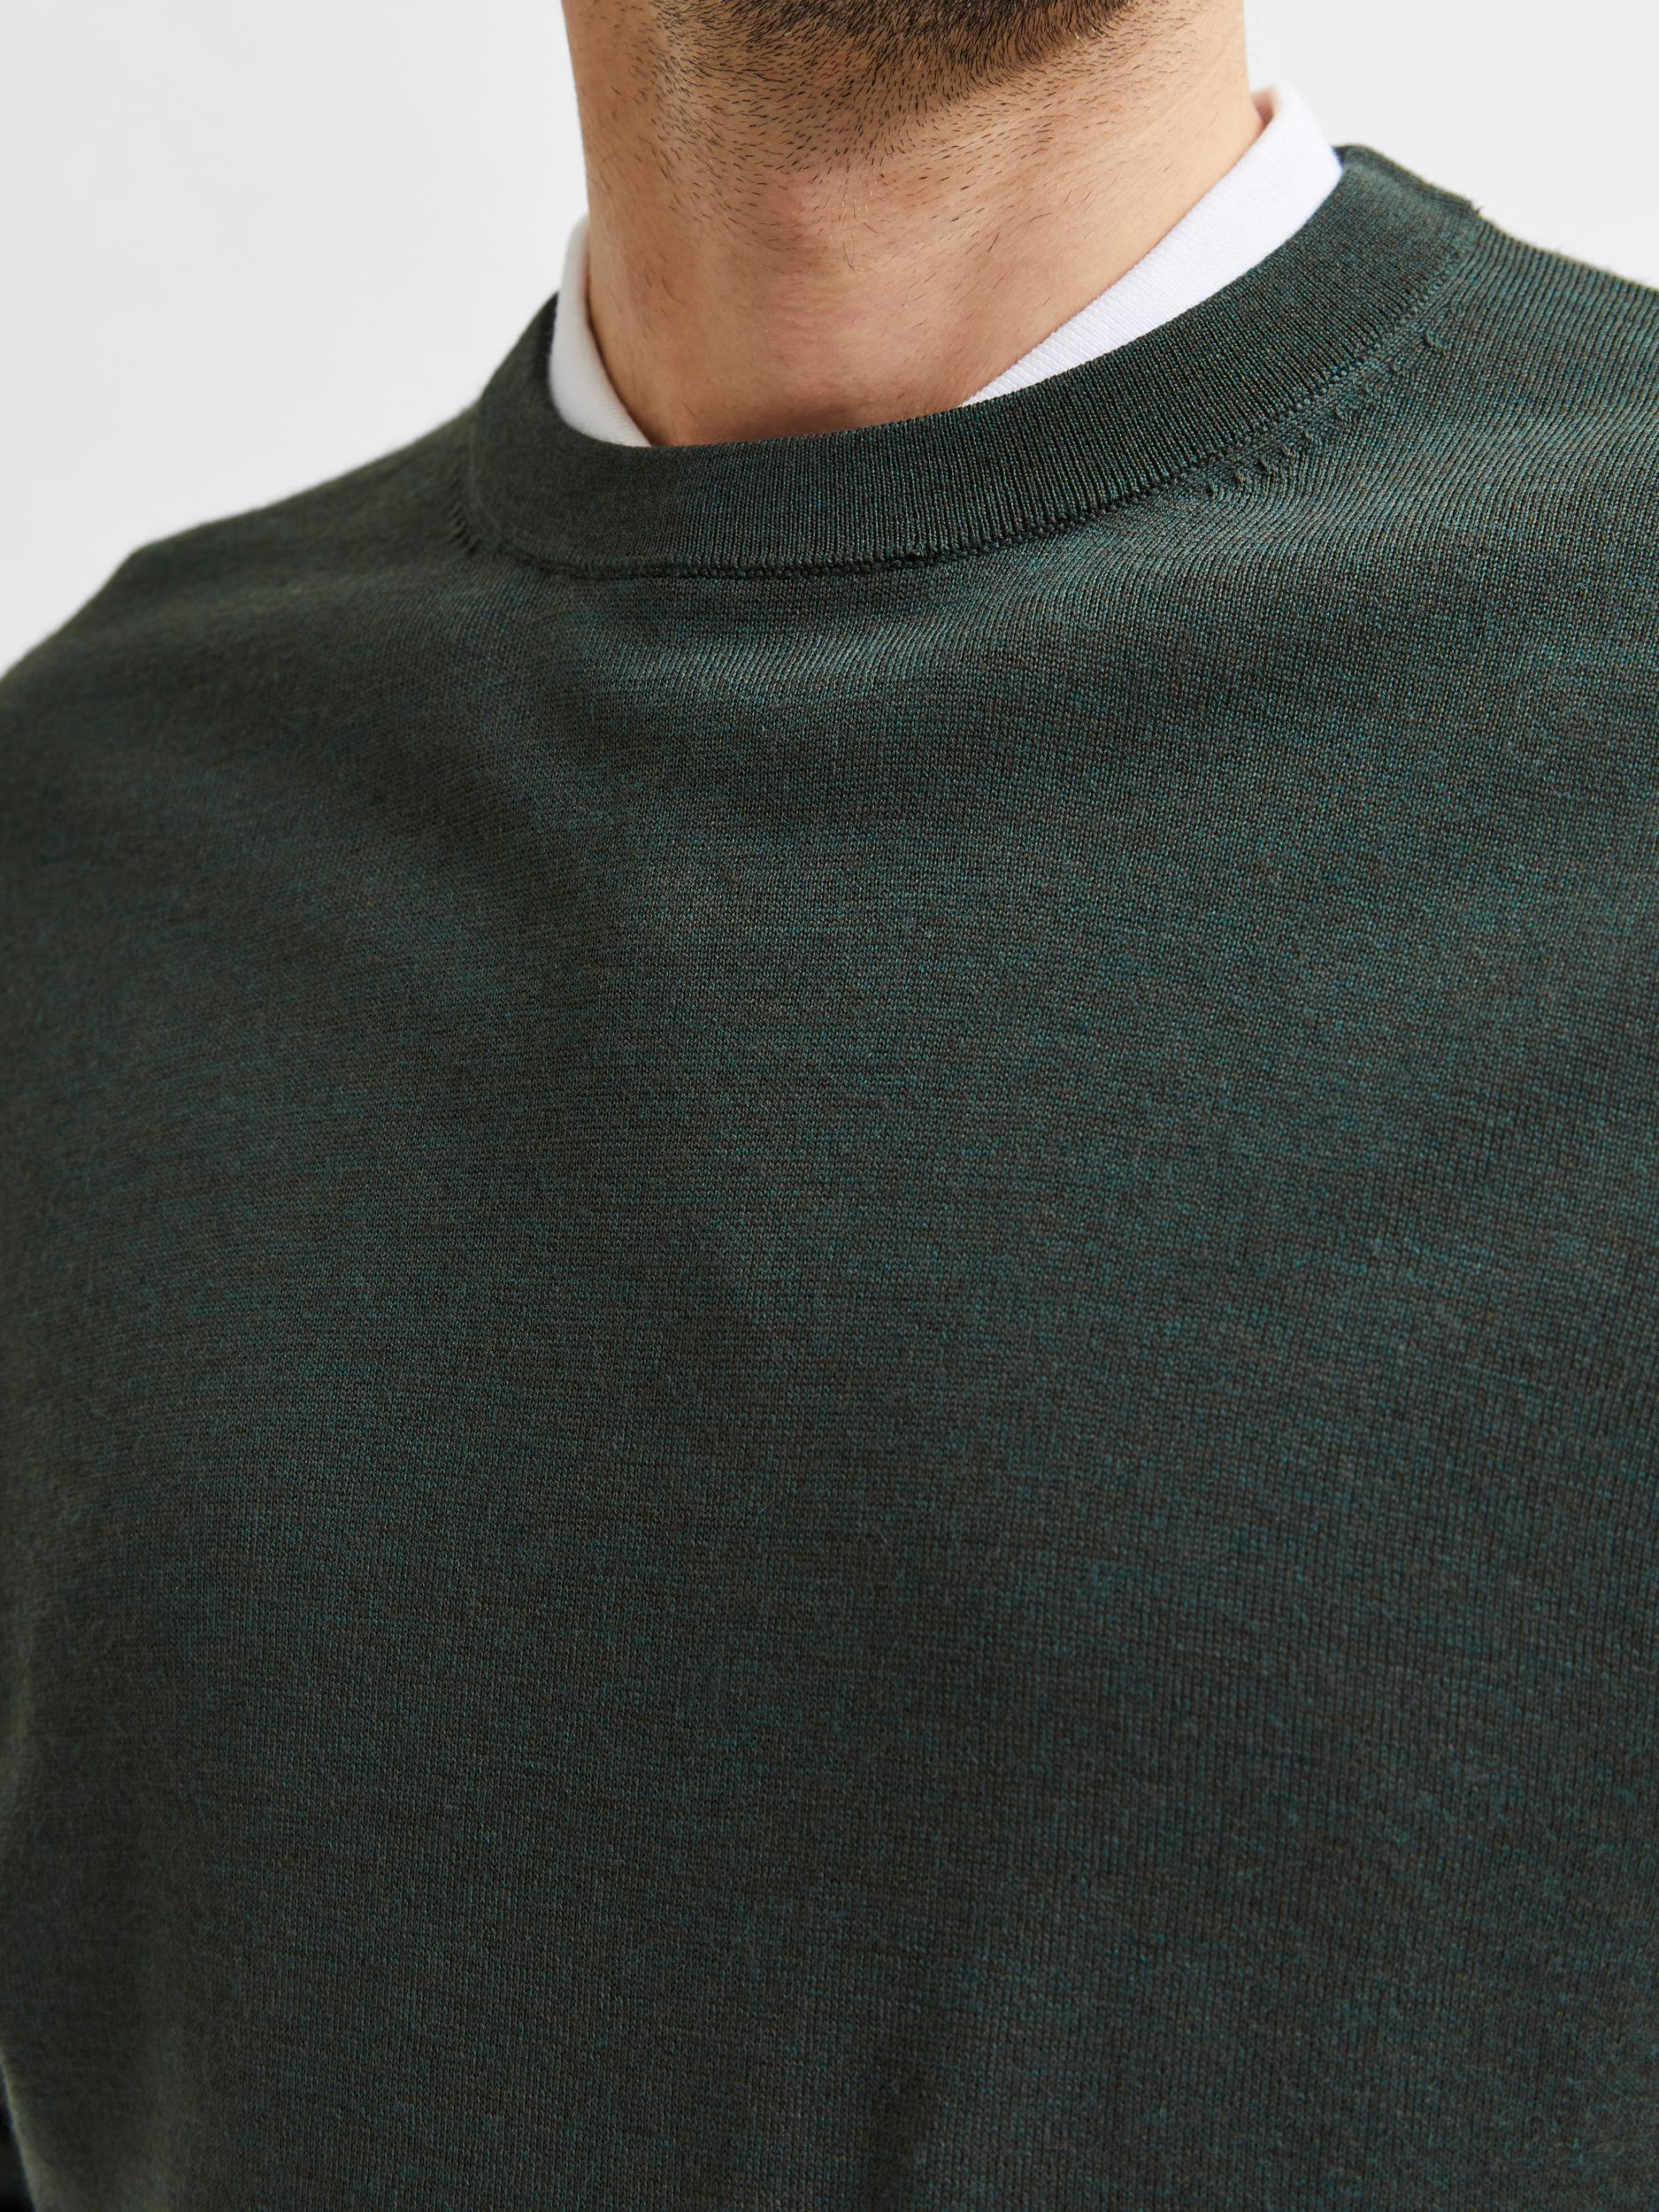 Selected Homme Town Merino LS trøje, darkest spruce, x-large